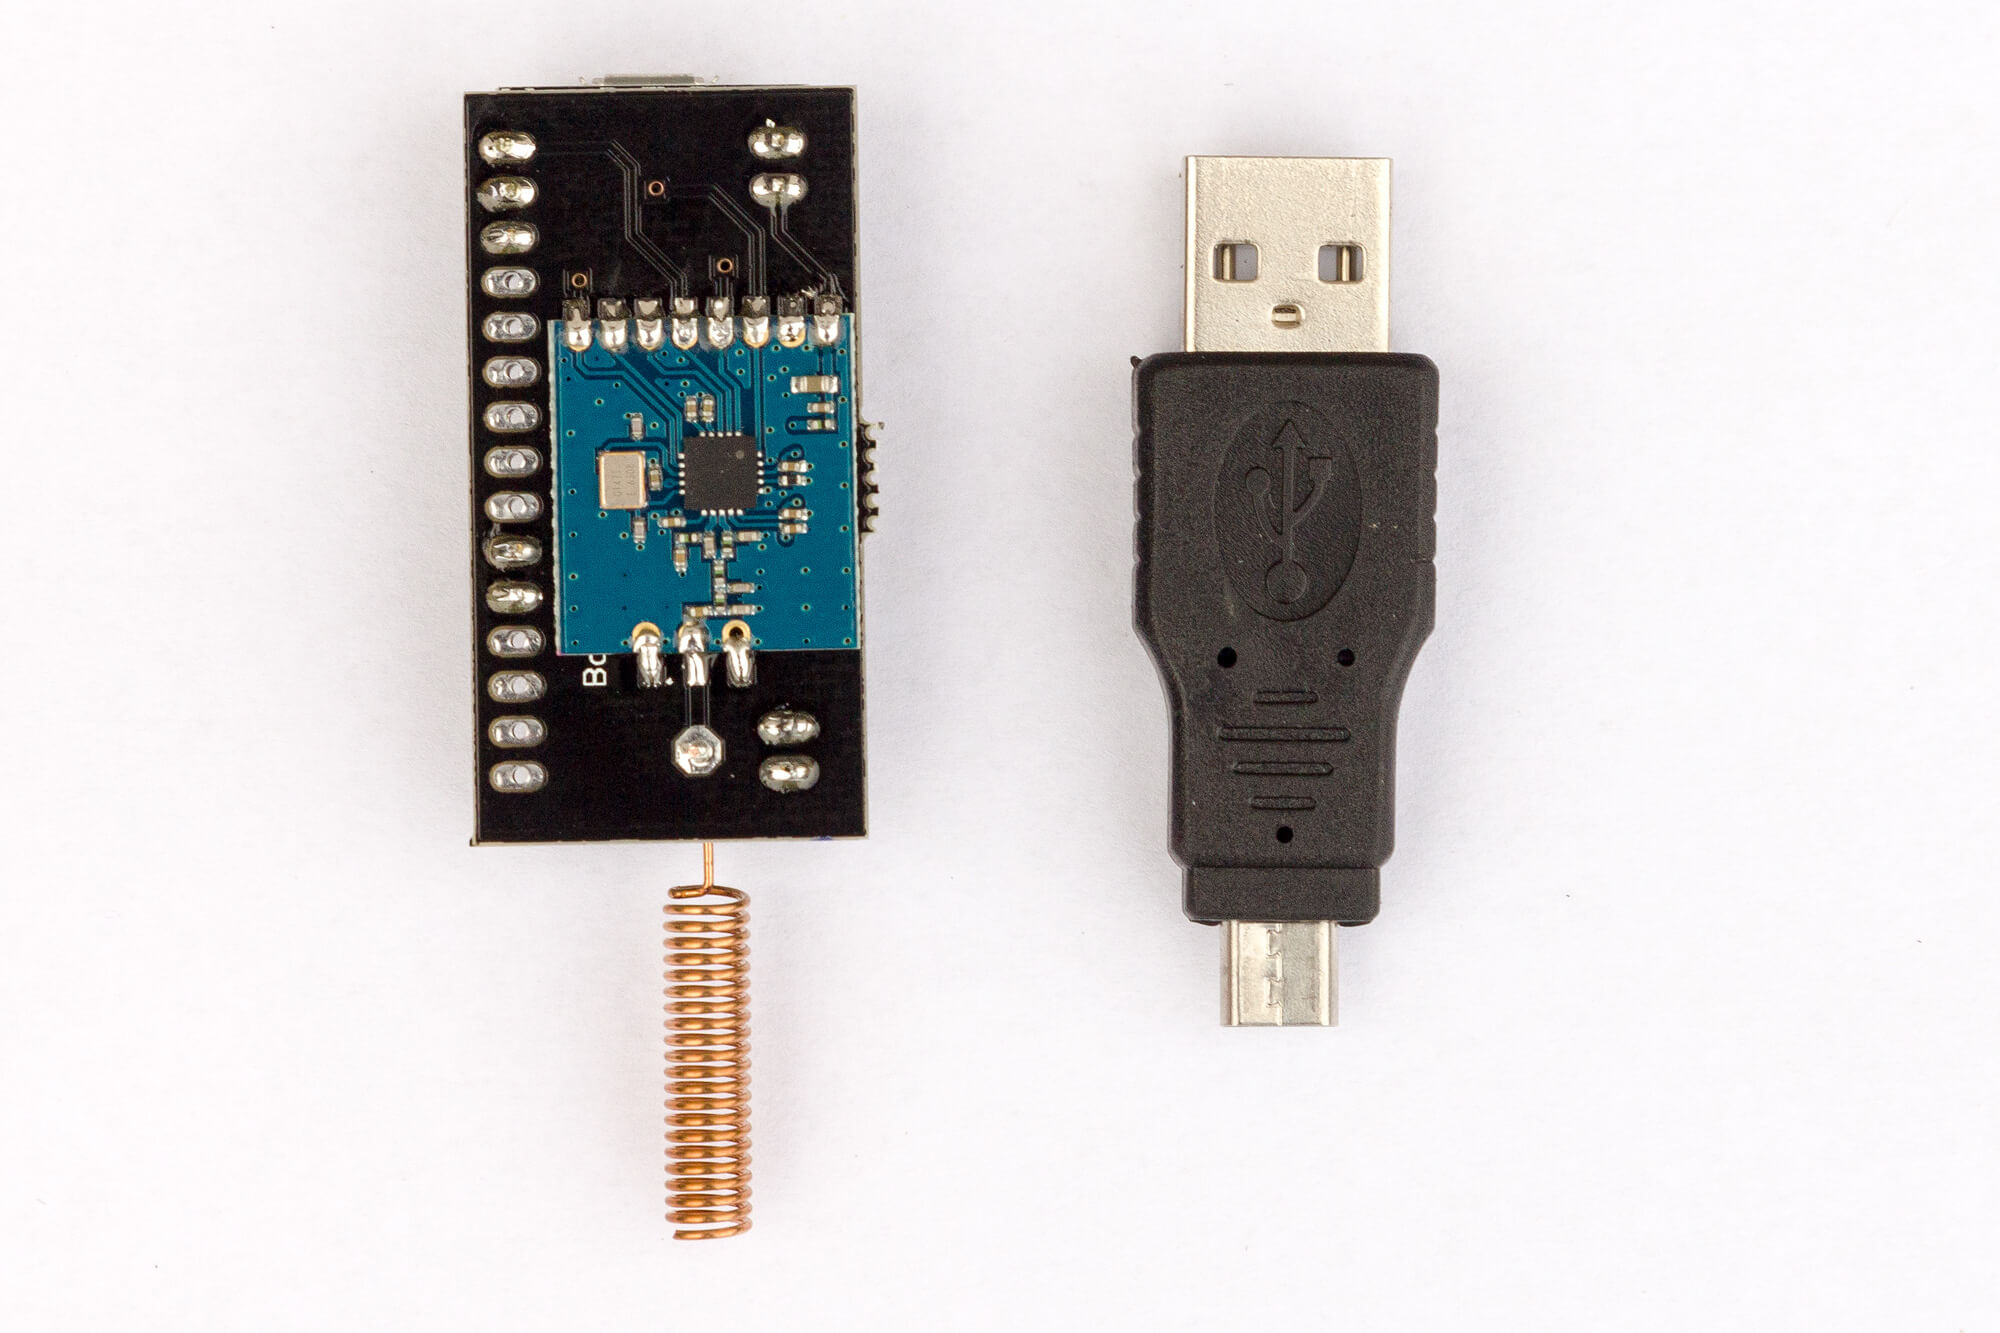 nanocul stick bausatz usb adapter cc1101 433mhz transceiver cul ccu2 fhem smarthome. Black Bedroom Furniture Sets. Home Design Ideas